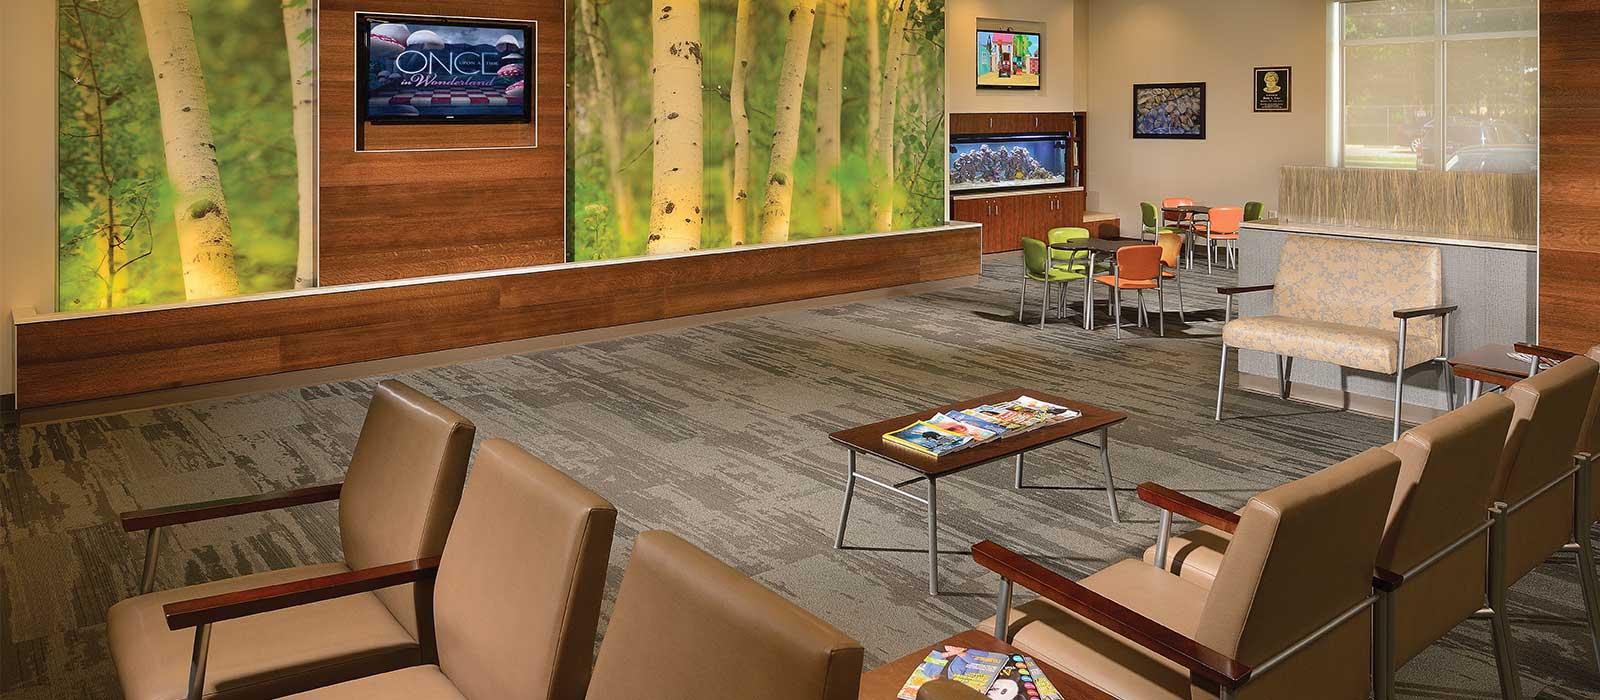 HealthLinc Waiting Room